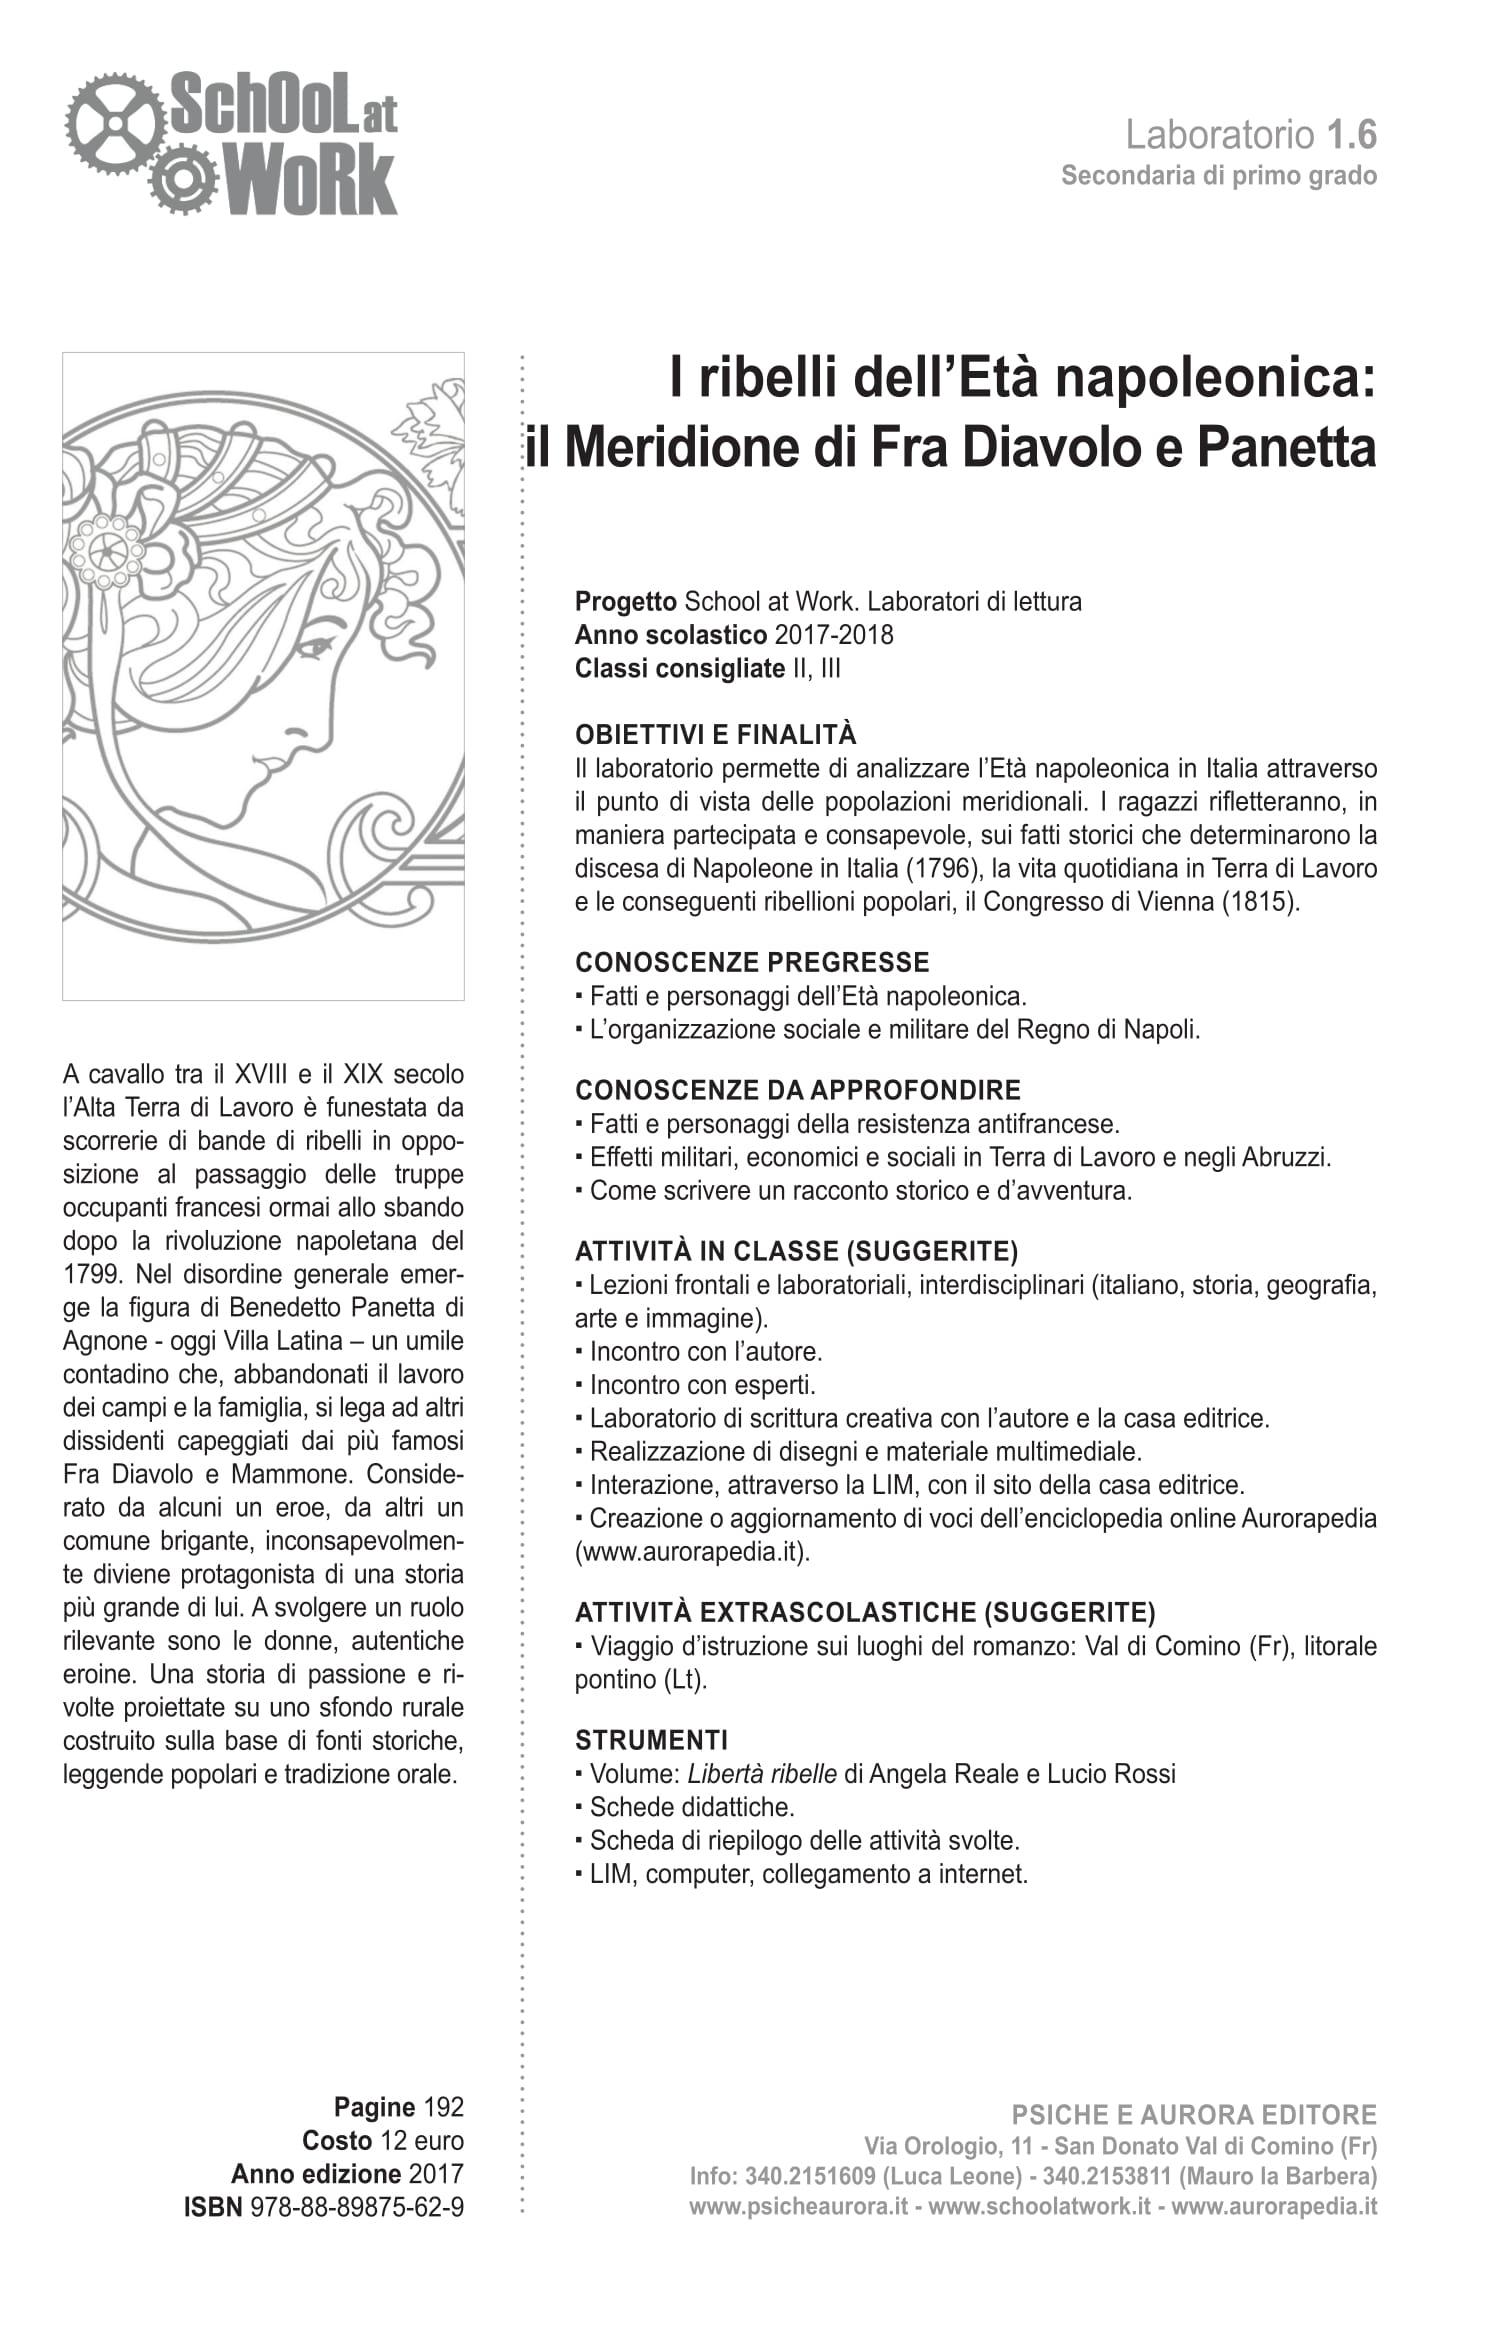 jpg-scheda-eta-napoleonica-panetta-1